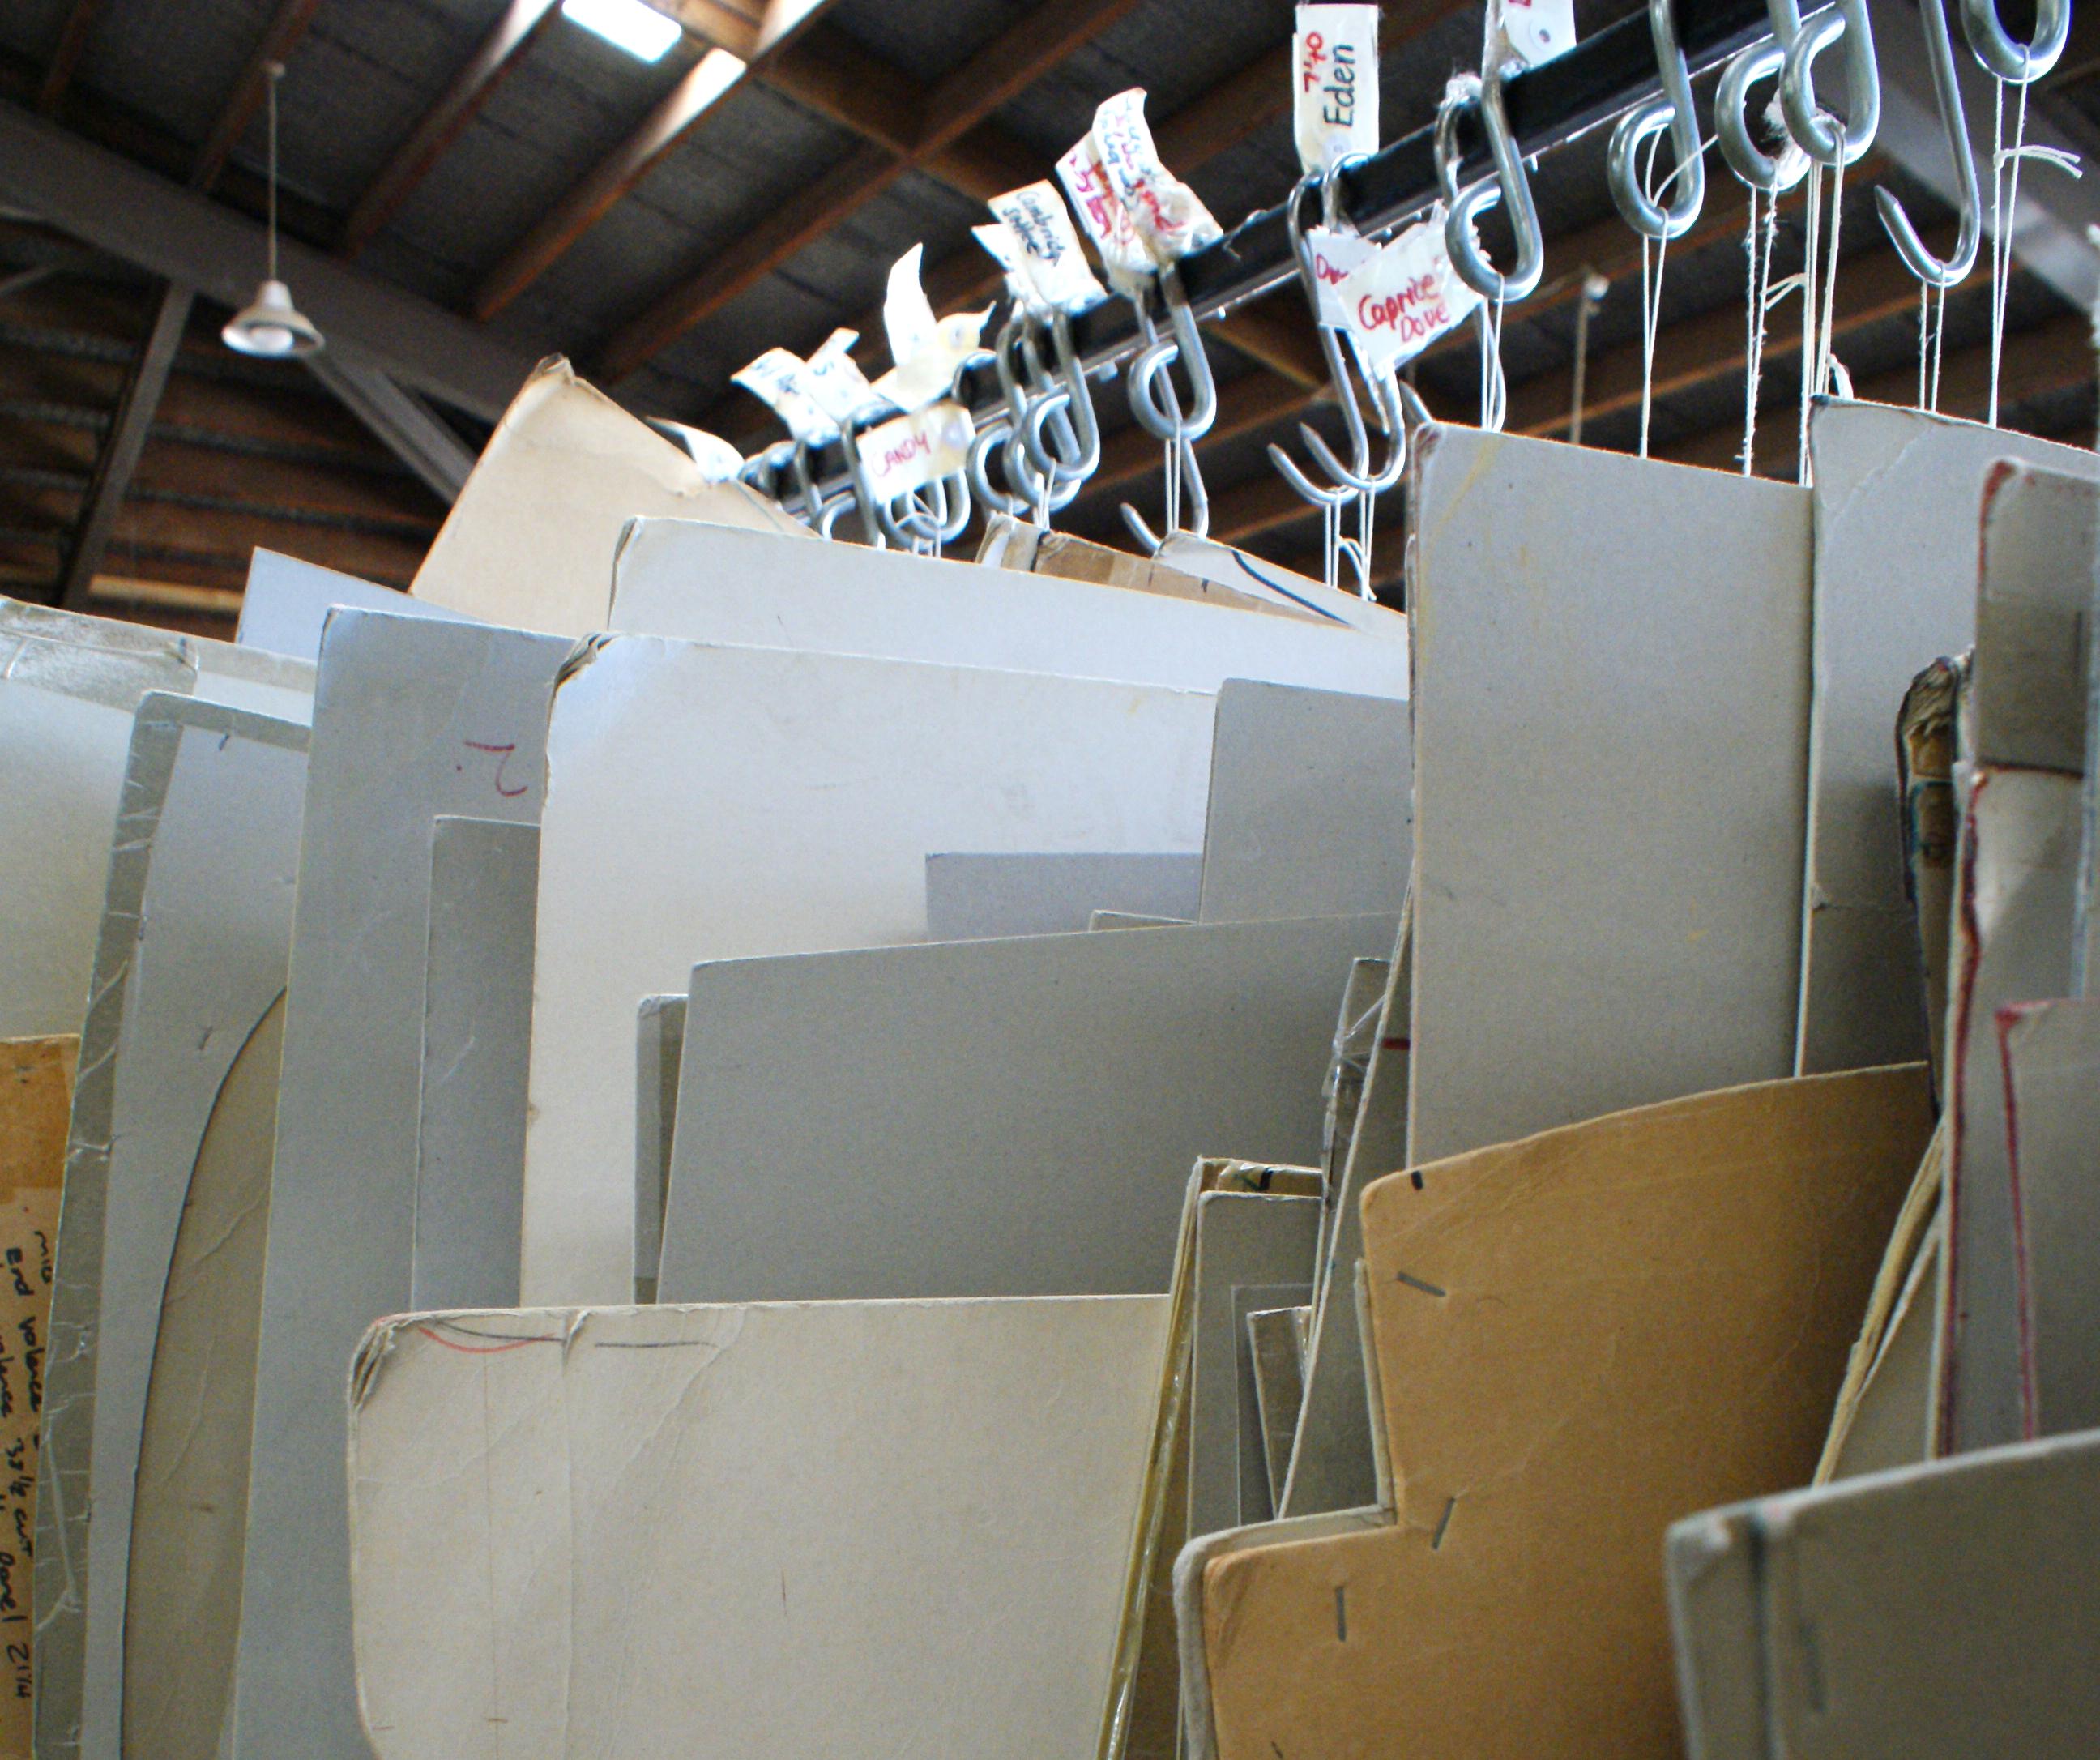 Templates of furniture designs